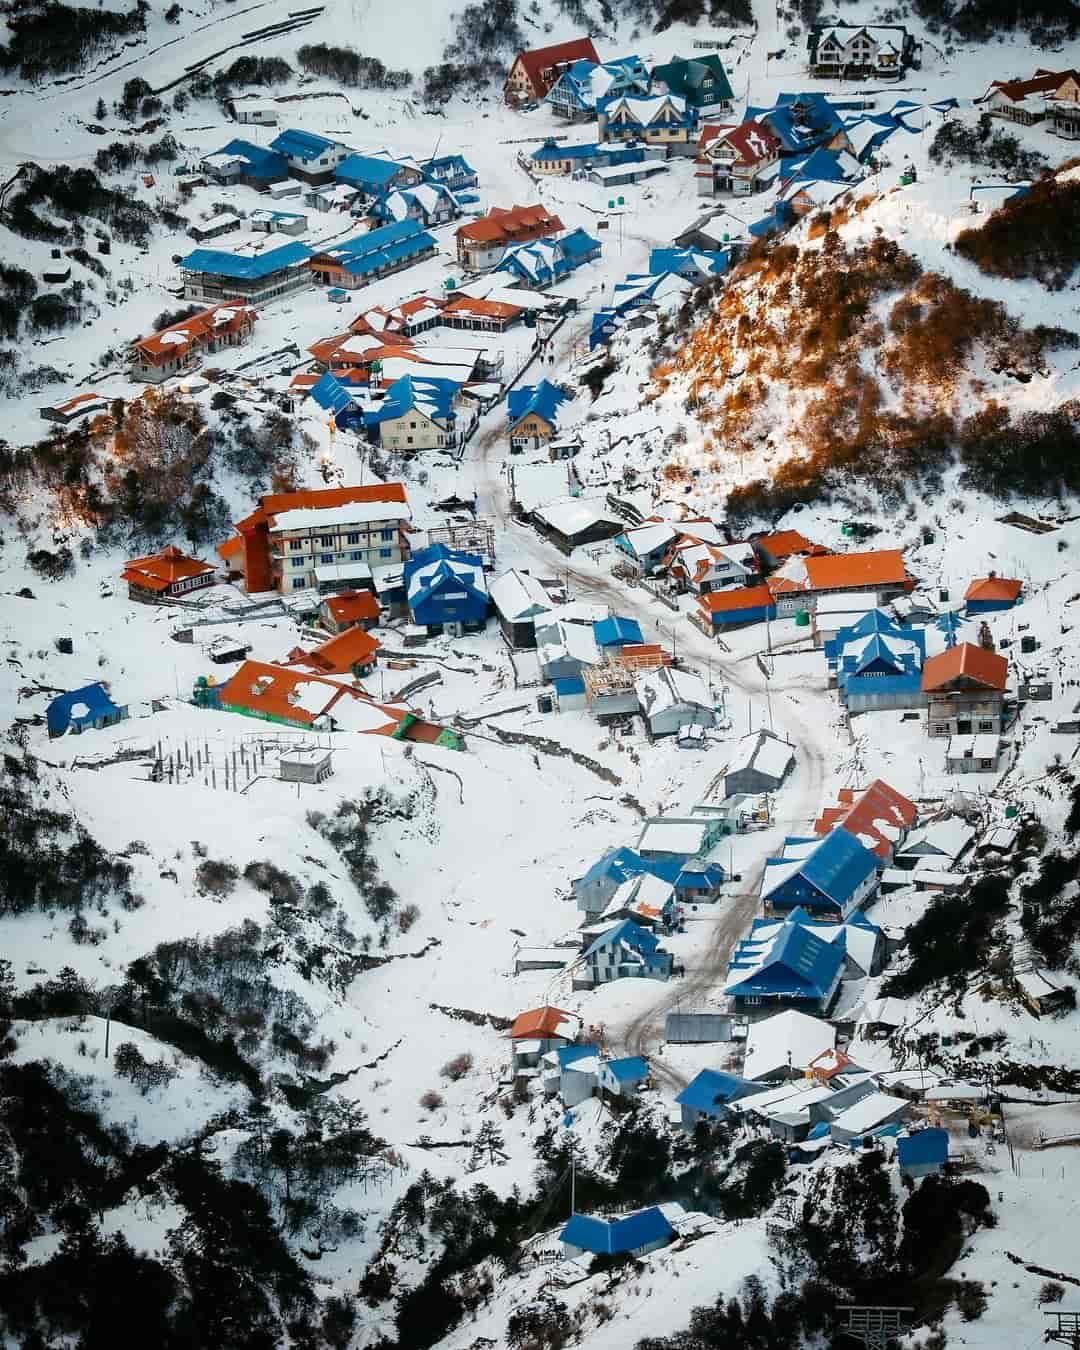 Snowfall in Kuri Kalinchowk